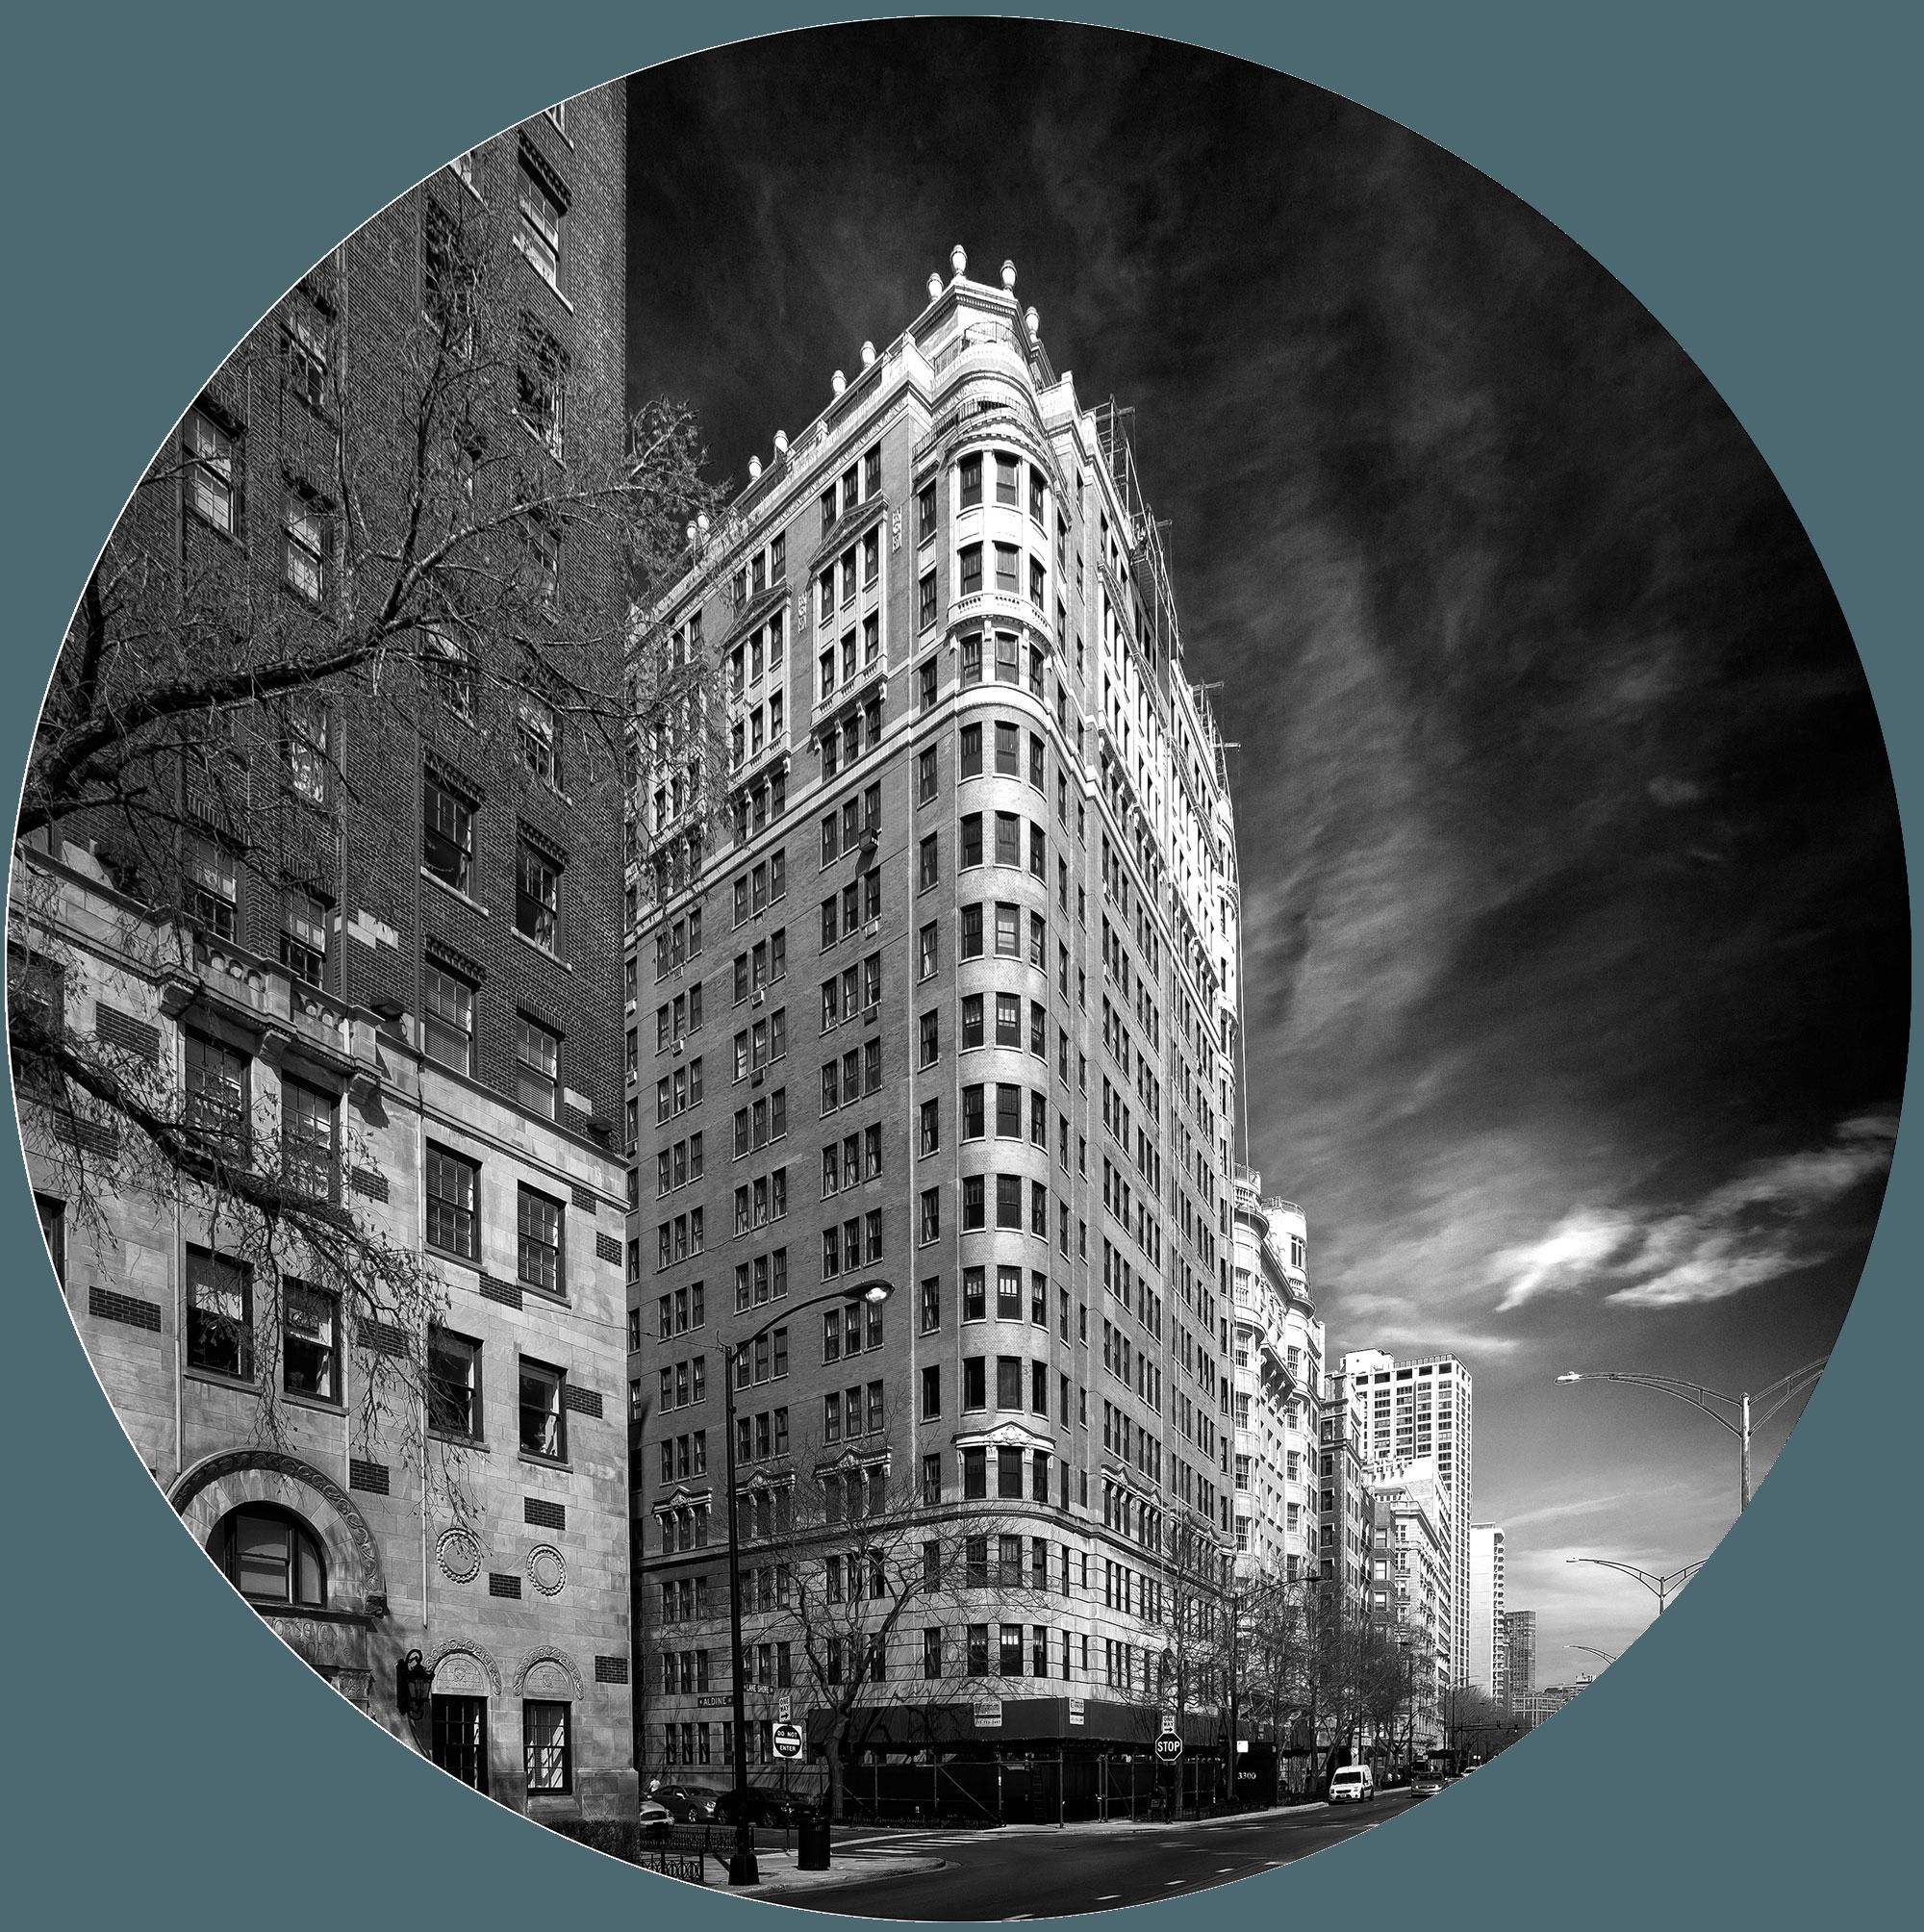 Sheridan-Aldine Building